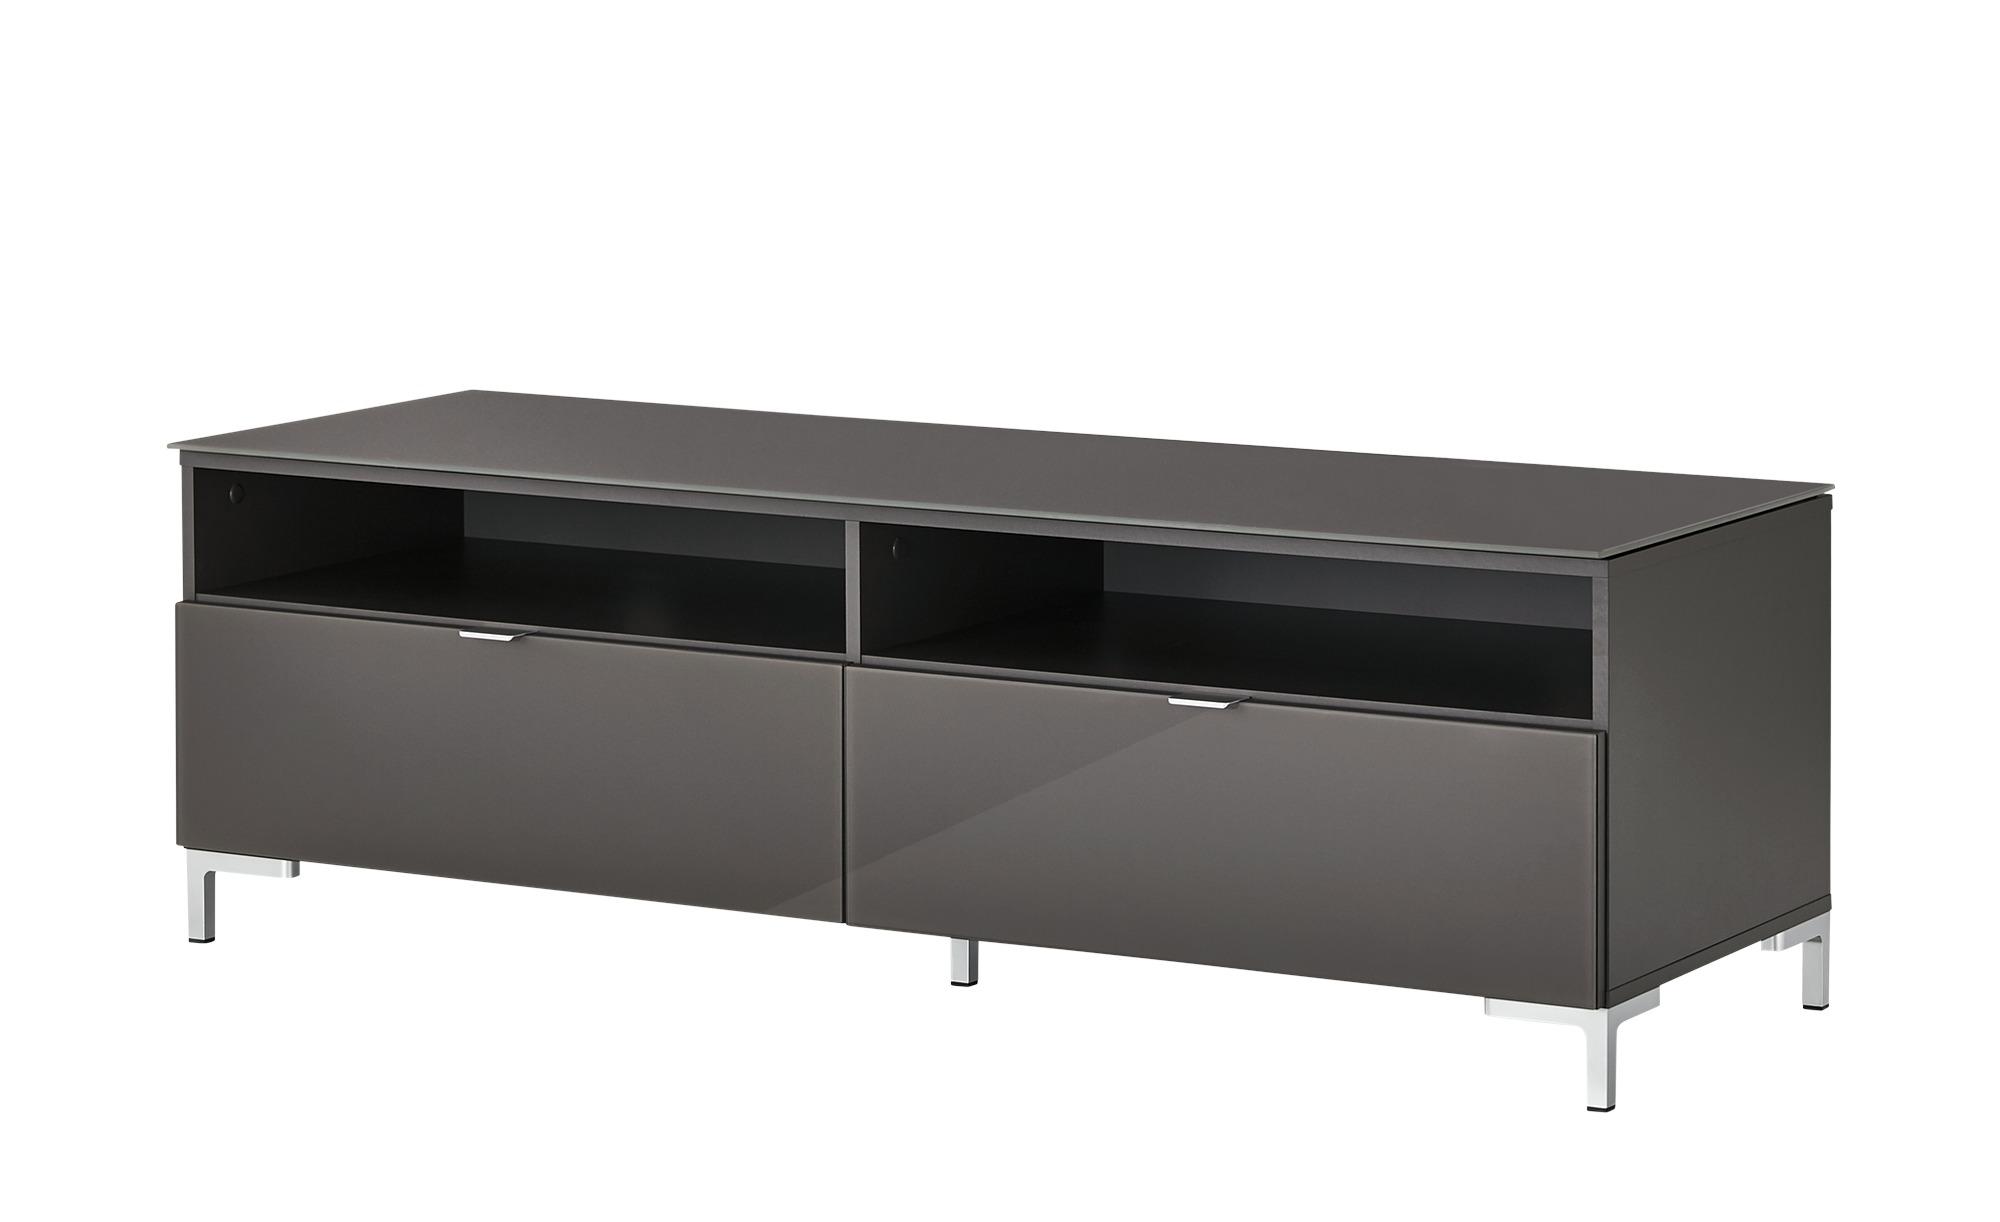 TV-Lowboard  Besano ¦ grau ¦ Maße (cm): B: 150 H: 48,5 T: 52,5 TV- & Media Möbel > TV-Racks - Höffner